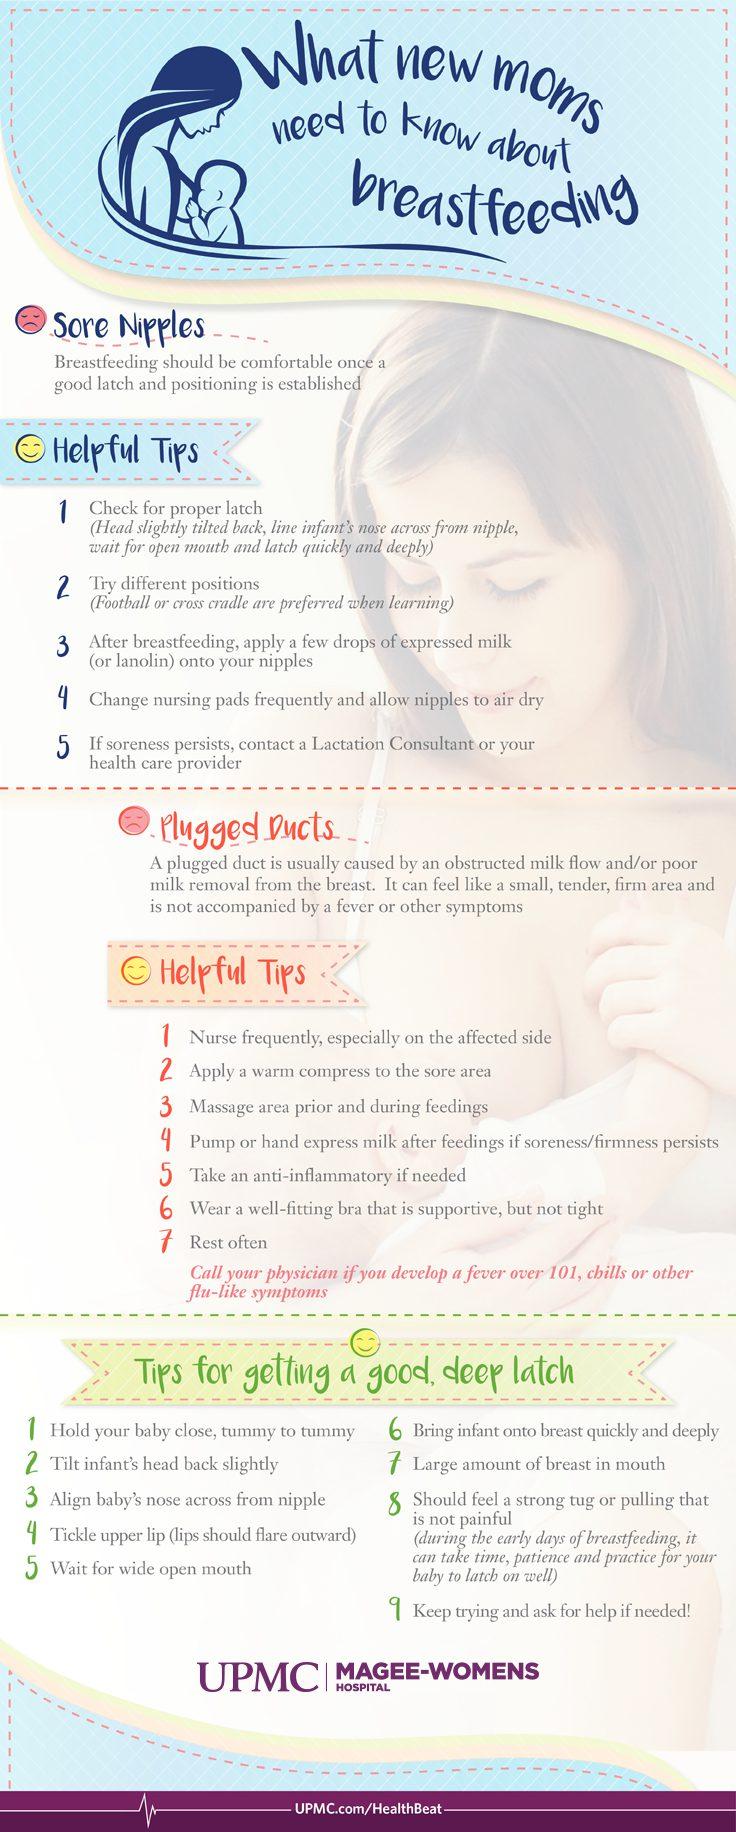 Get information on breastfeeding